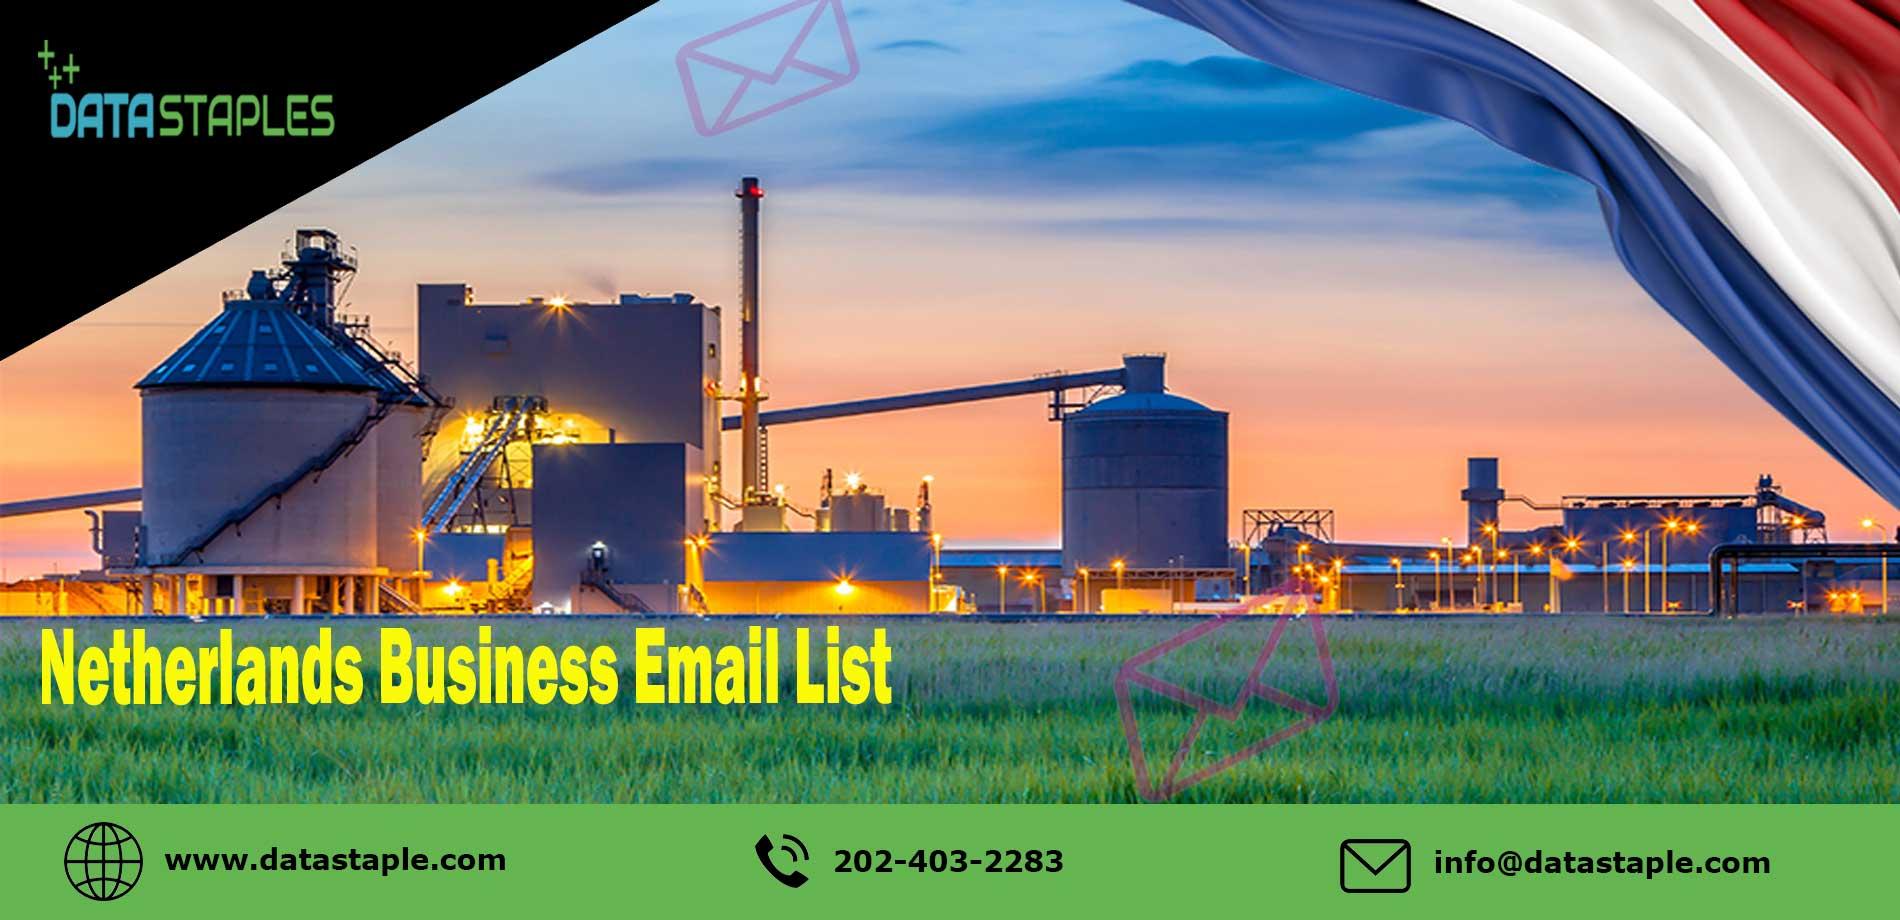 Netherlands Business Email List   DataStaples